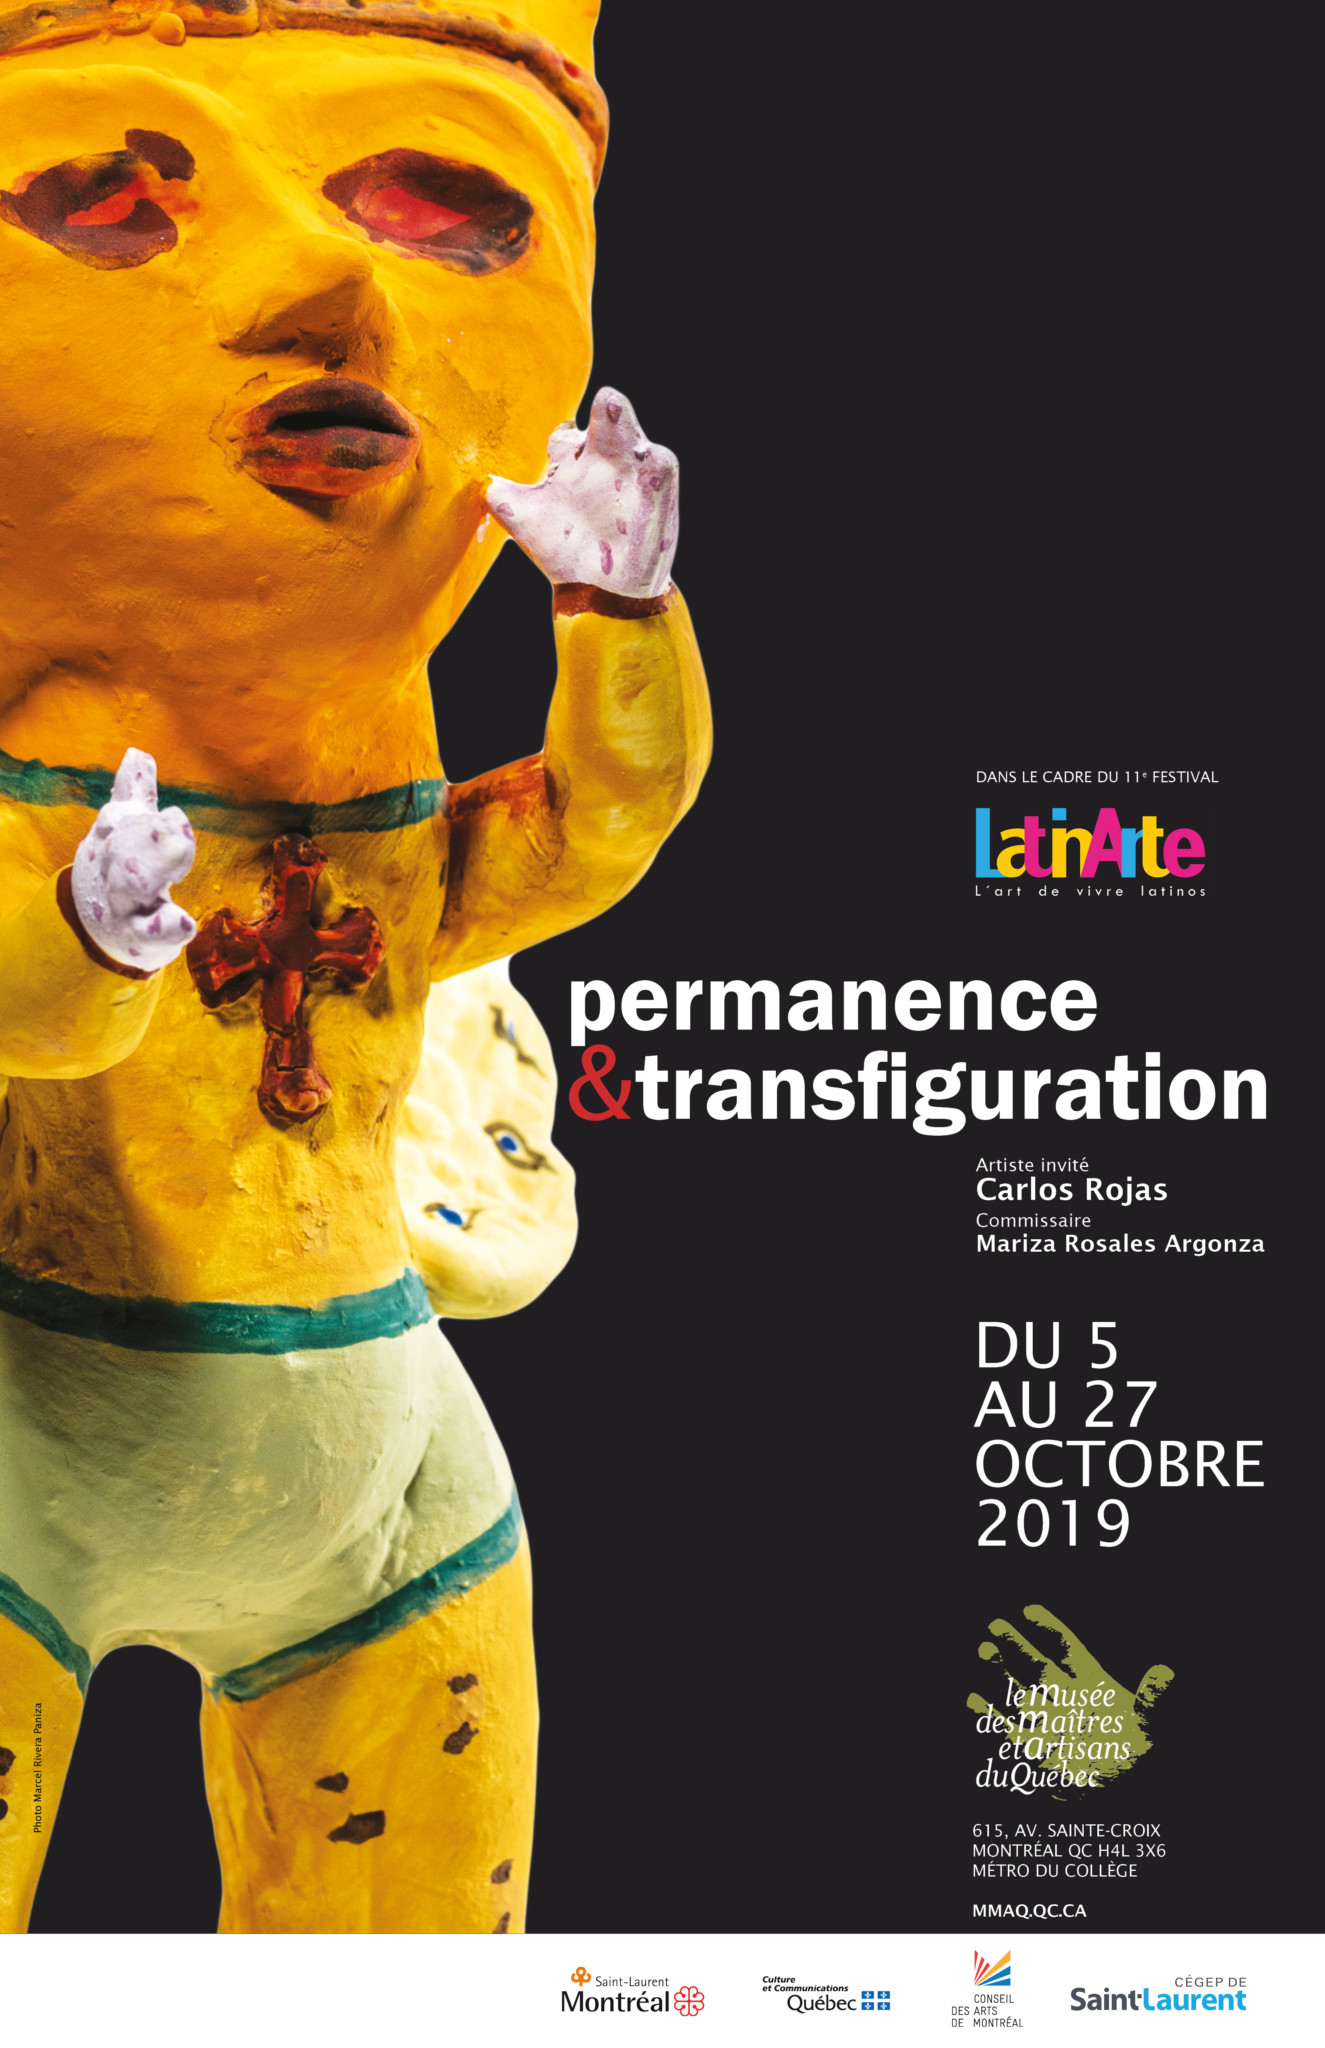 Permanence et transfiguration